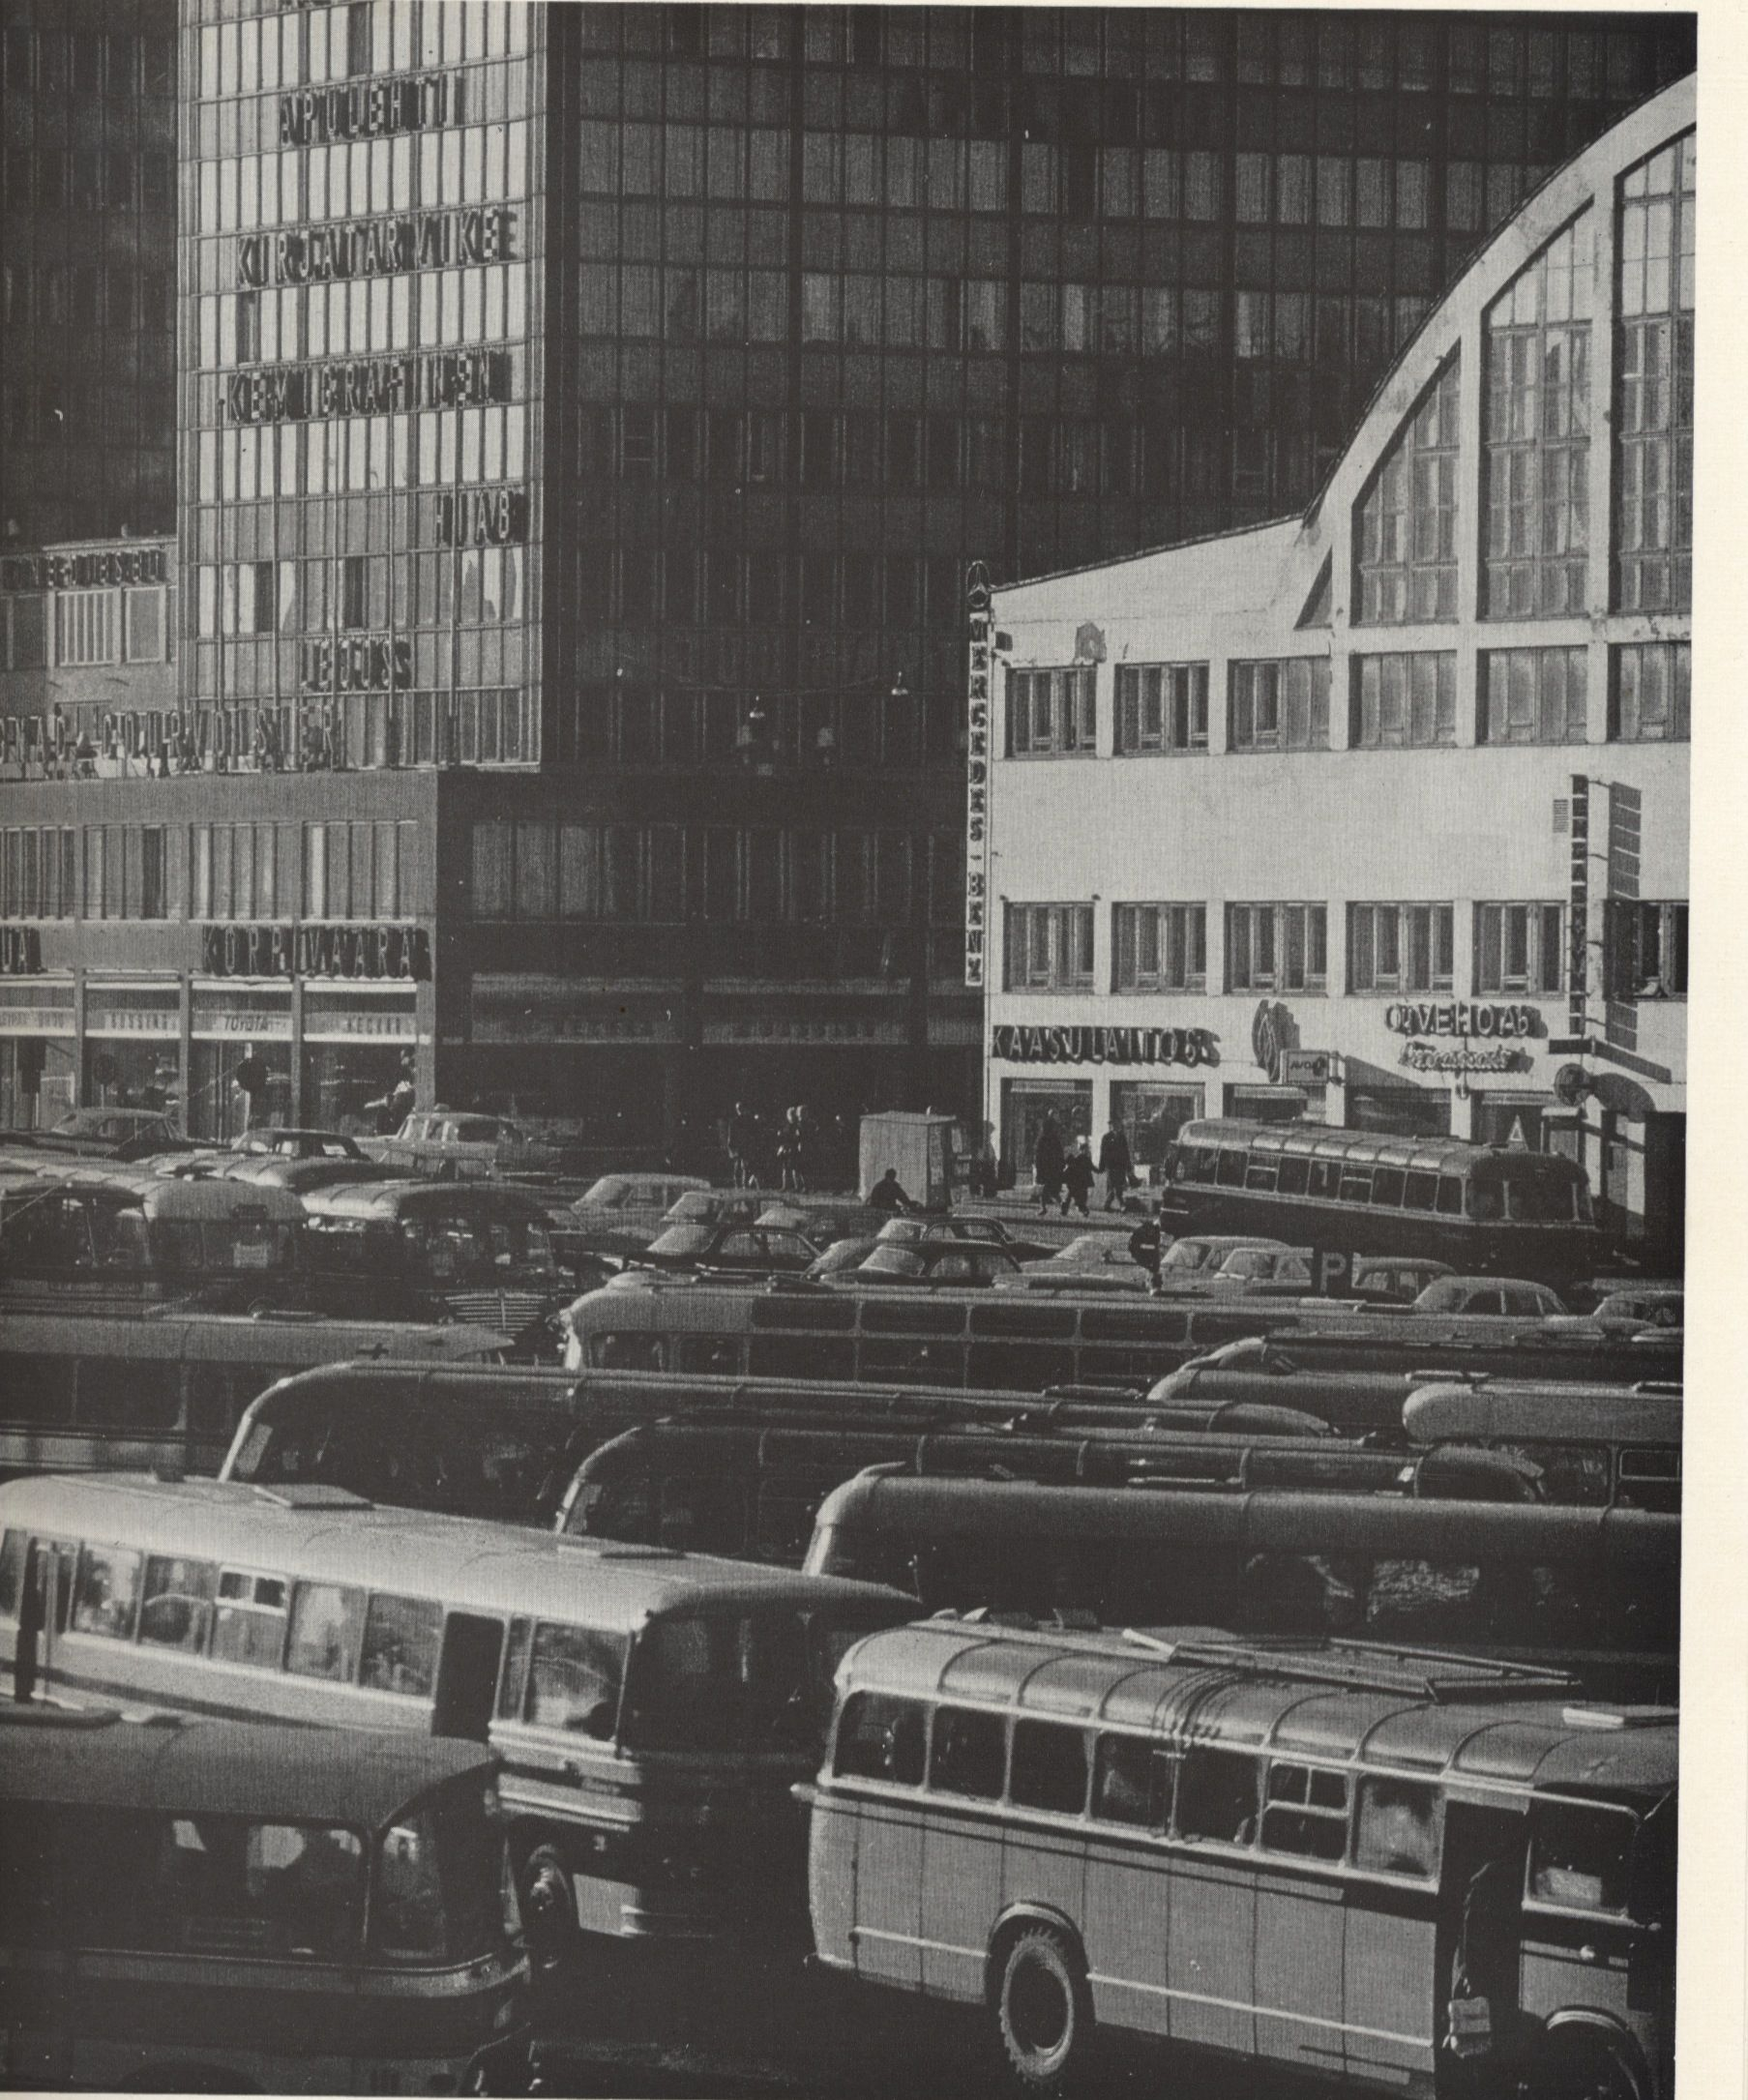 Kamppi in 1966. Photo: Asko Rysä. Published in Helsinki and Her People.